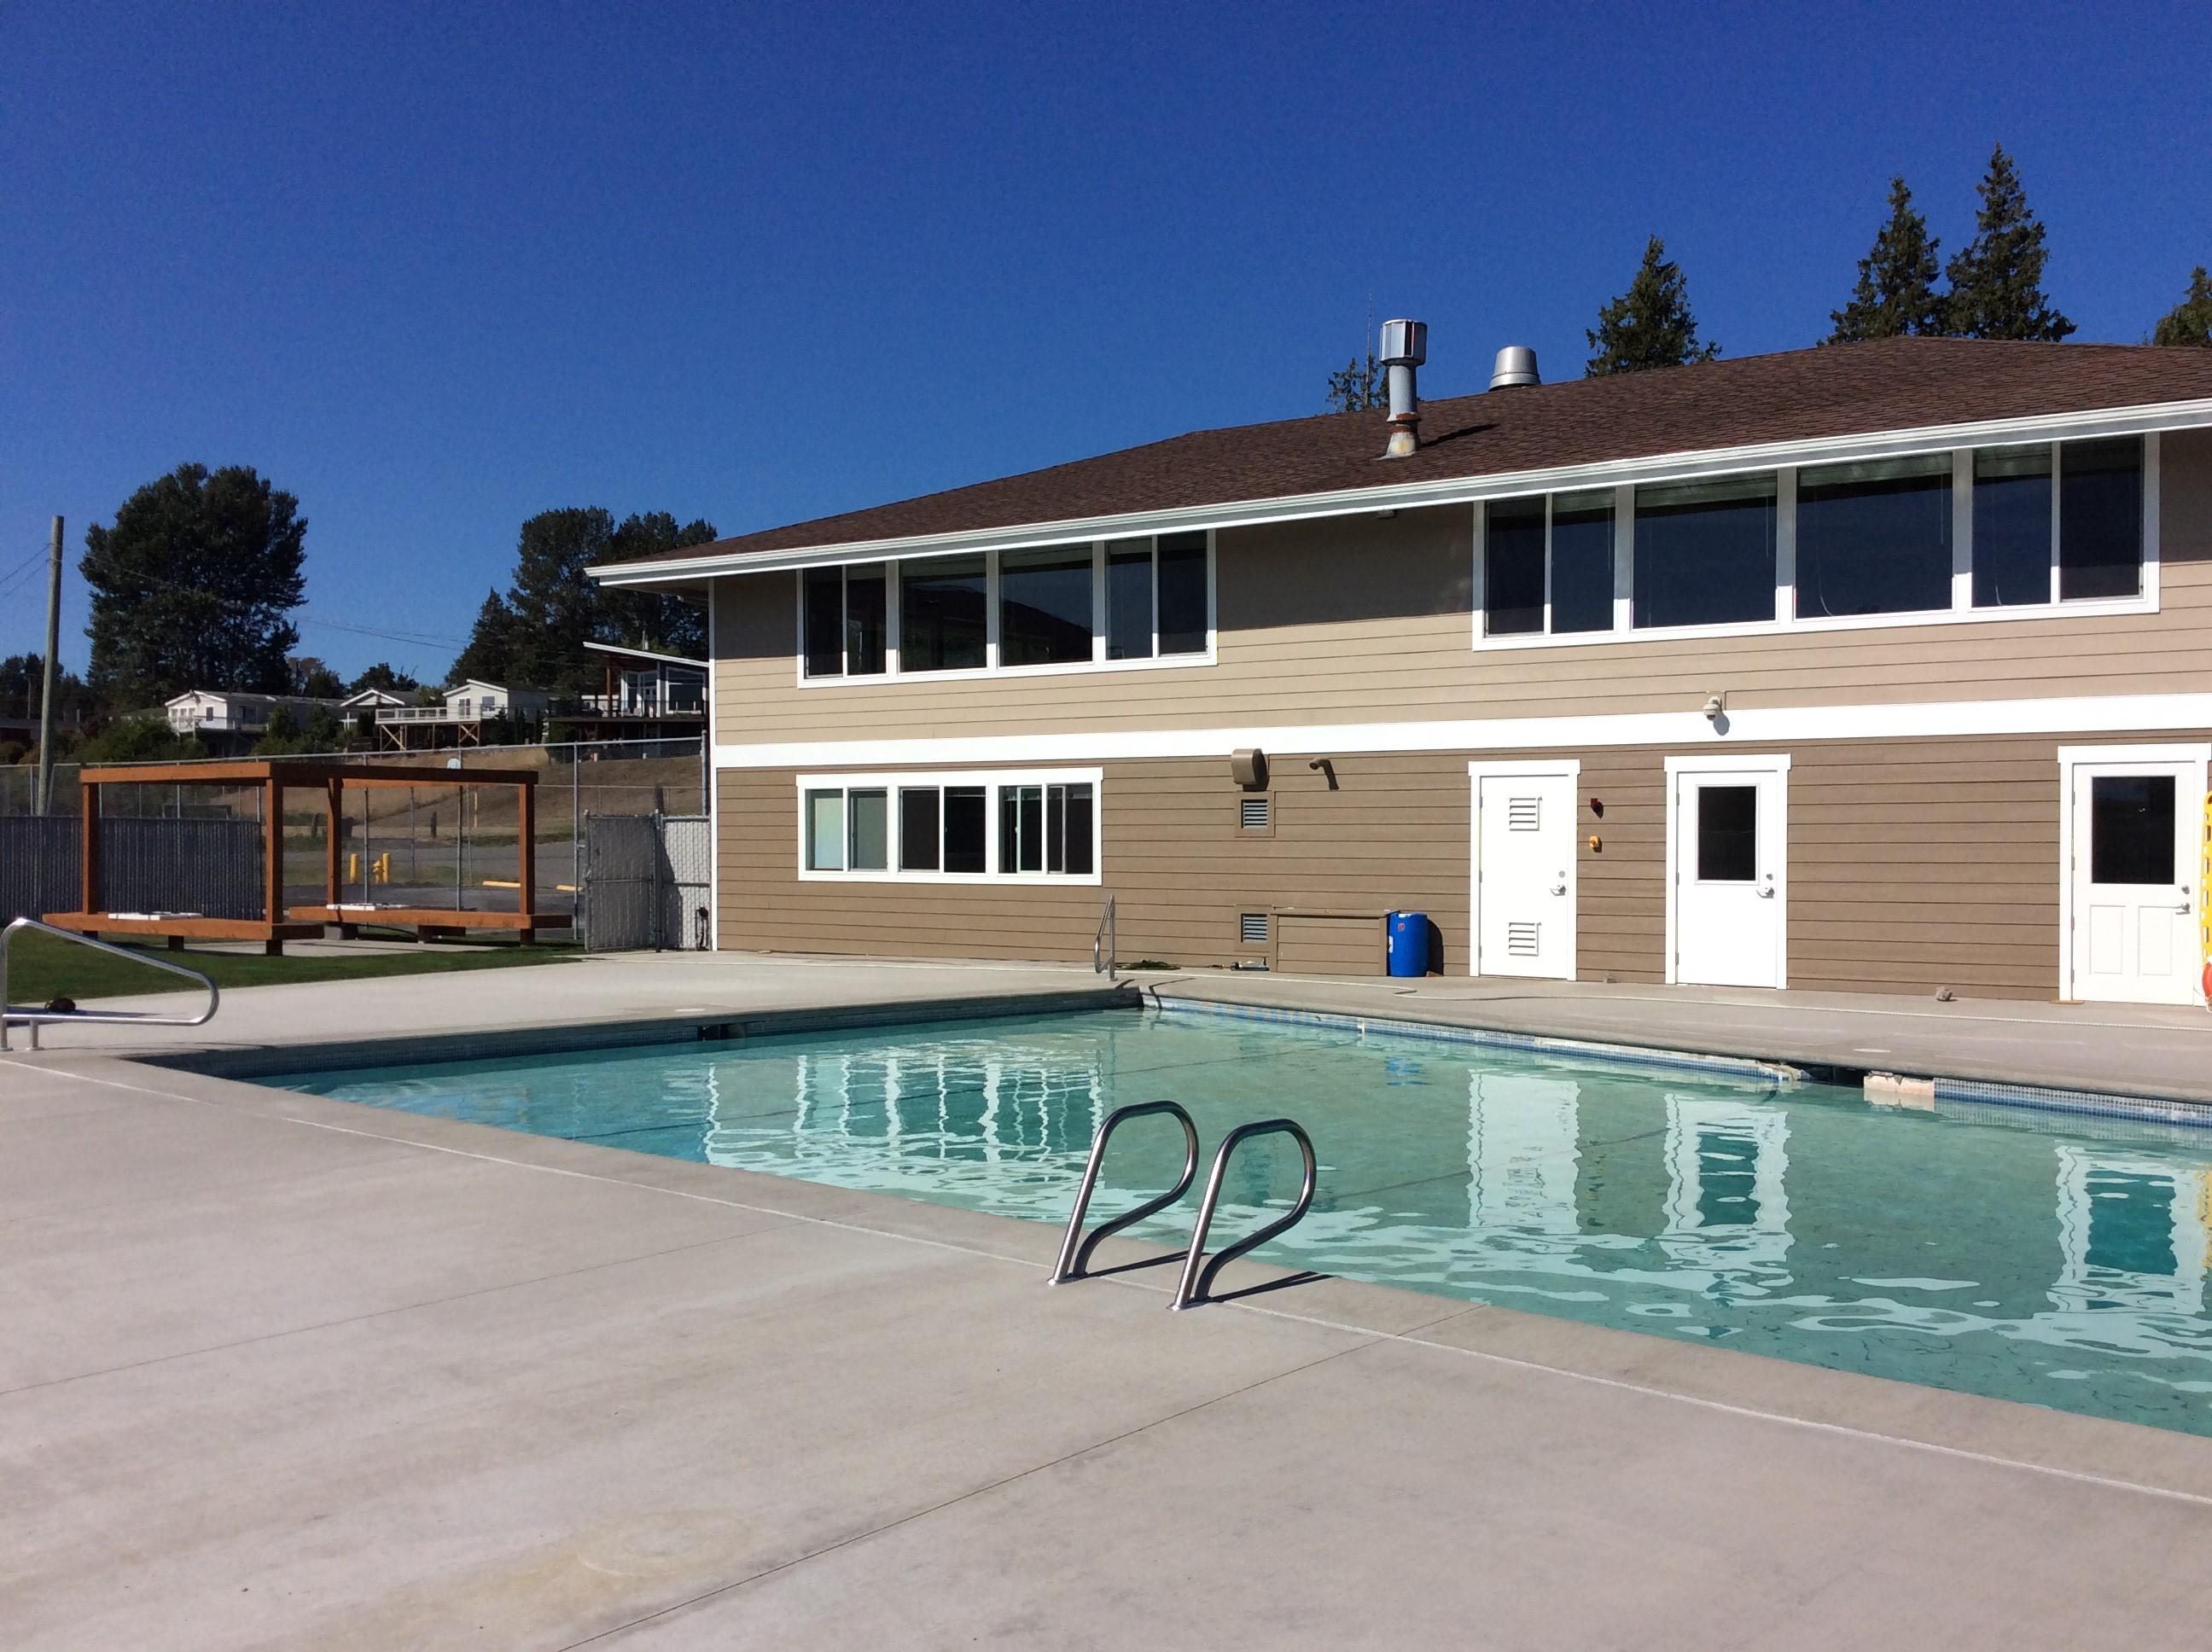 Club House & Pool   Sandy Point Improvement Company